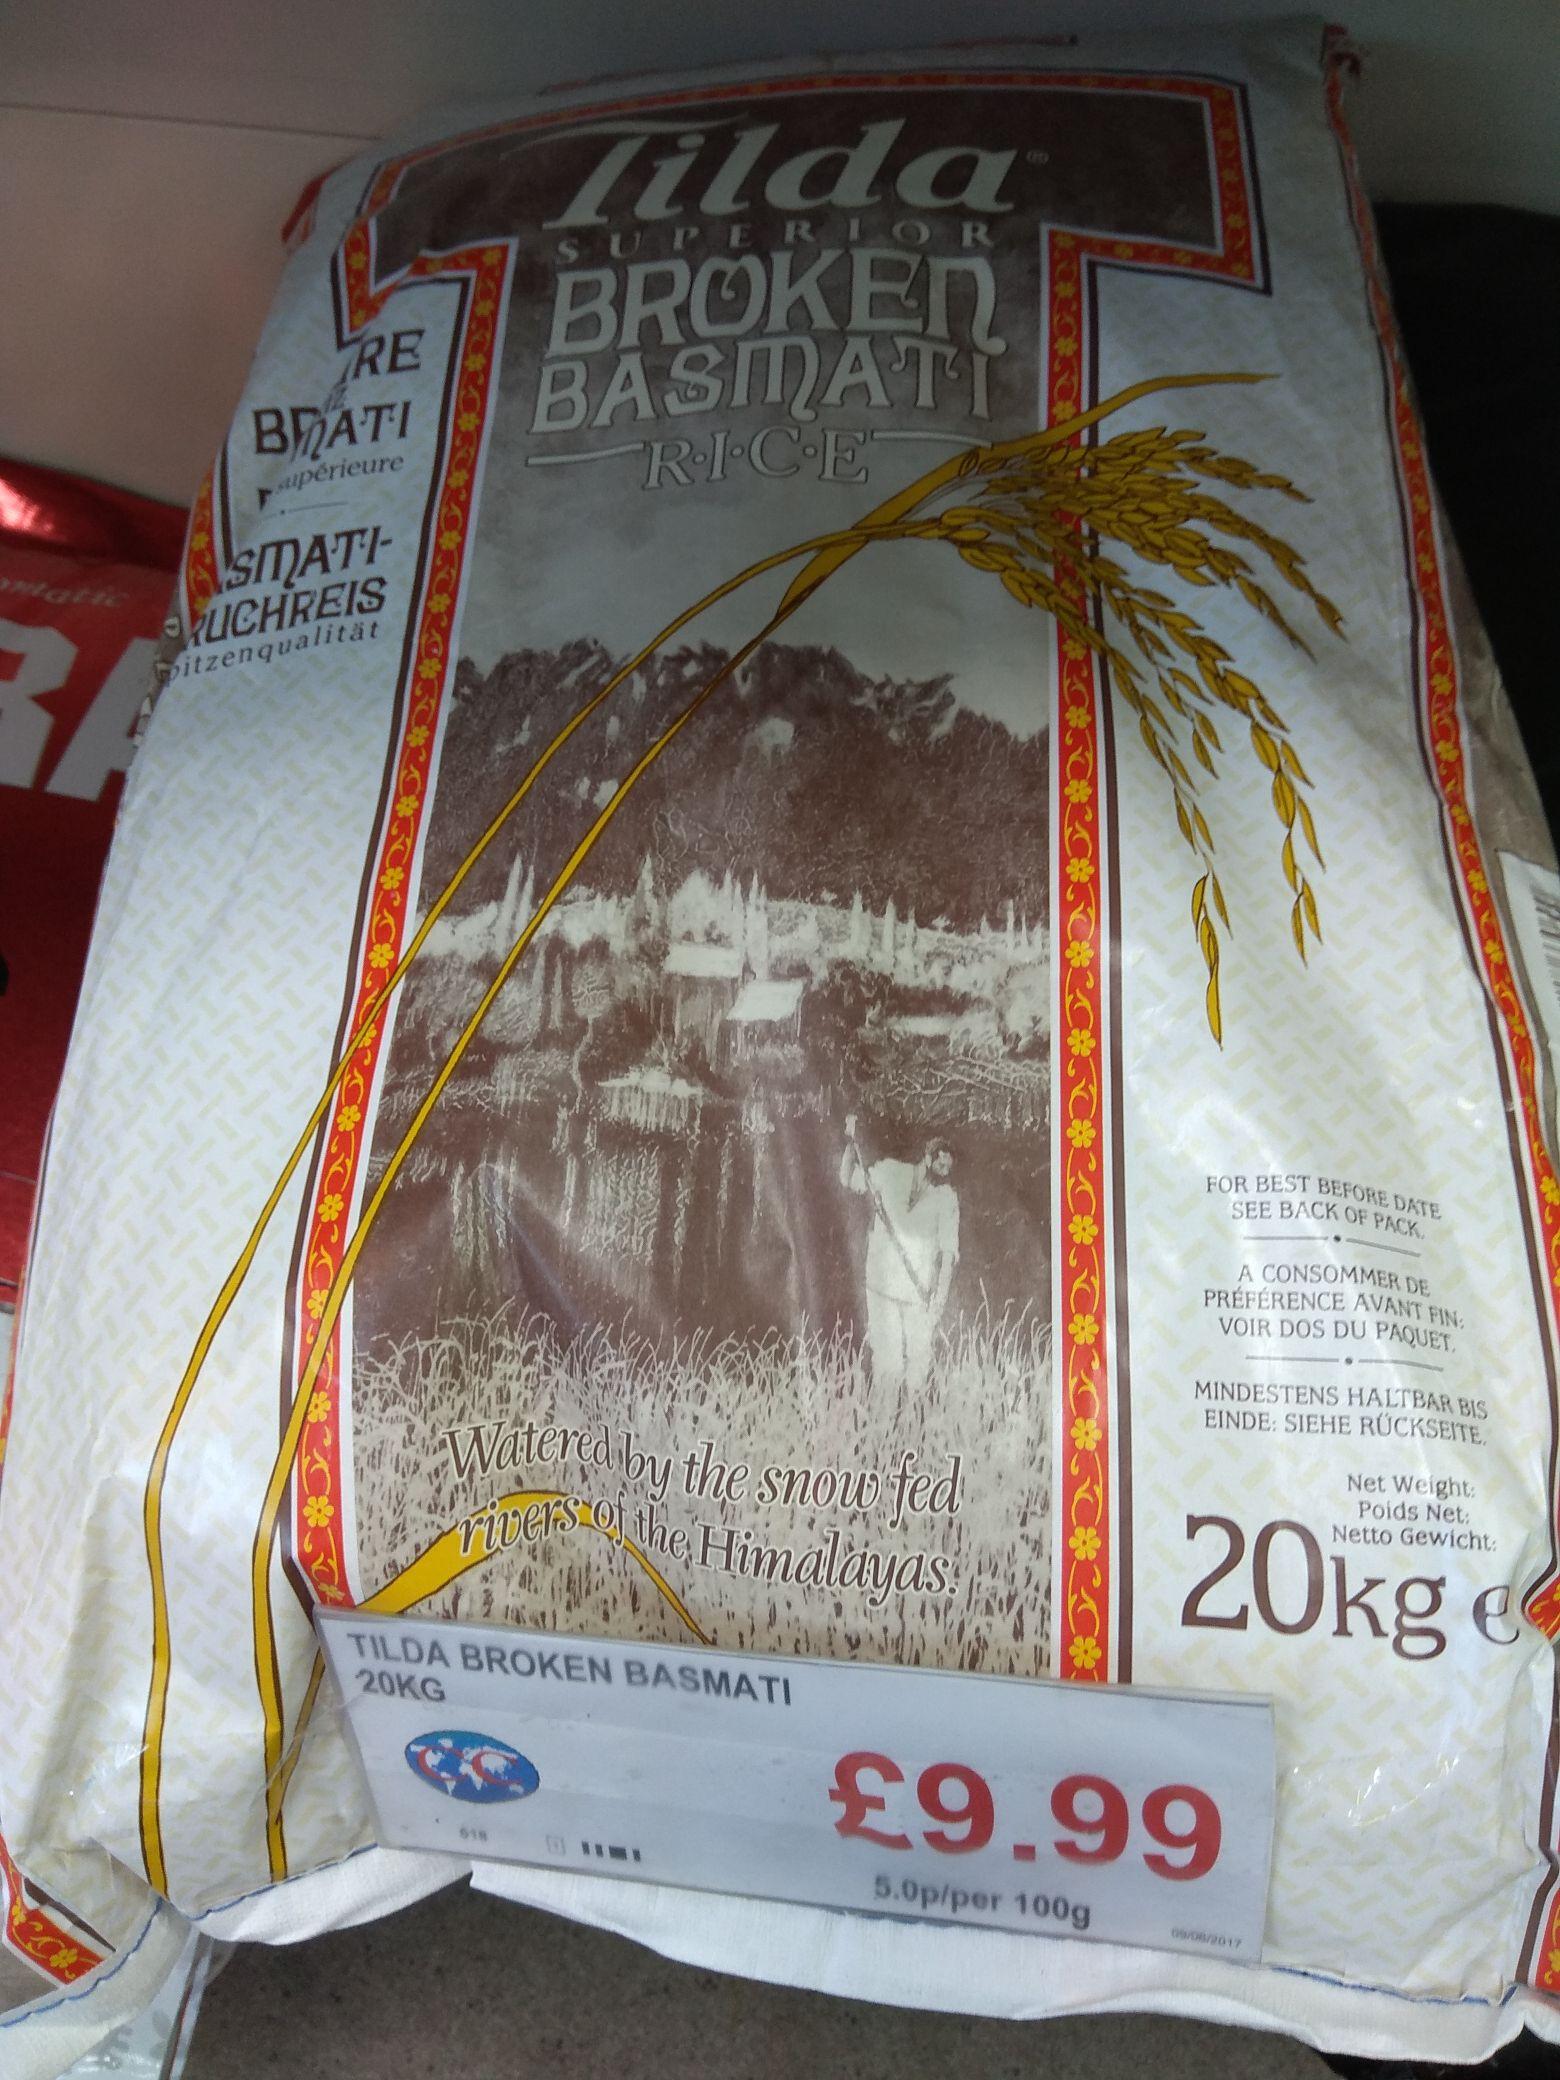 Tilda Superior Broken Basmati Rice 20kg - £9.99 instore @ CC Continental Supermarket (Leeds)